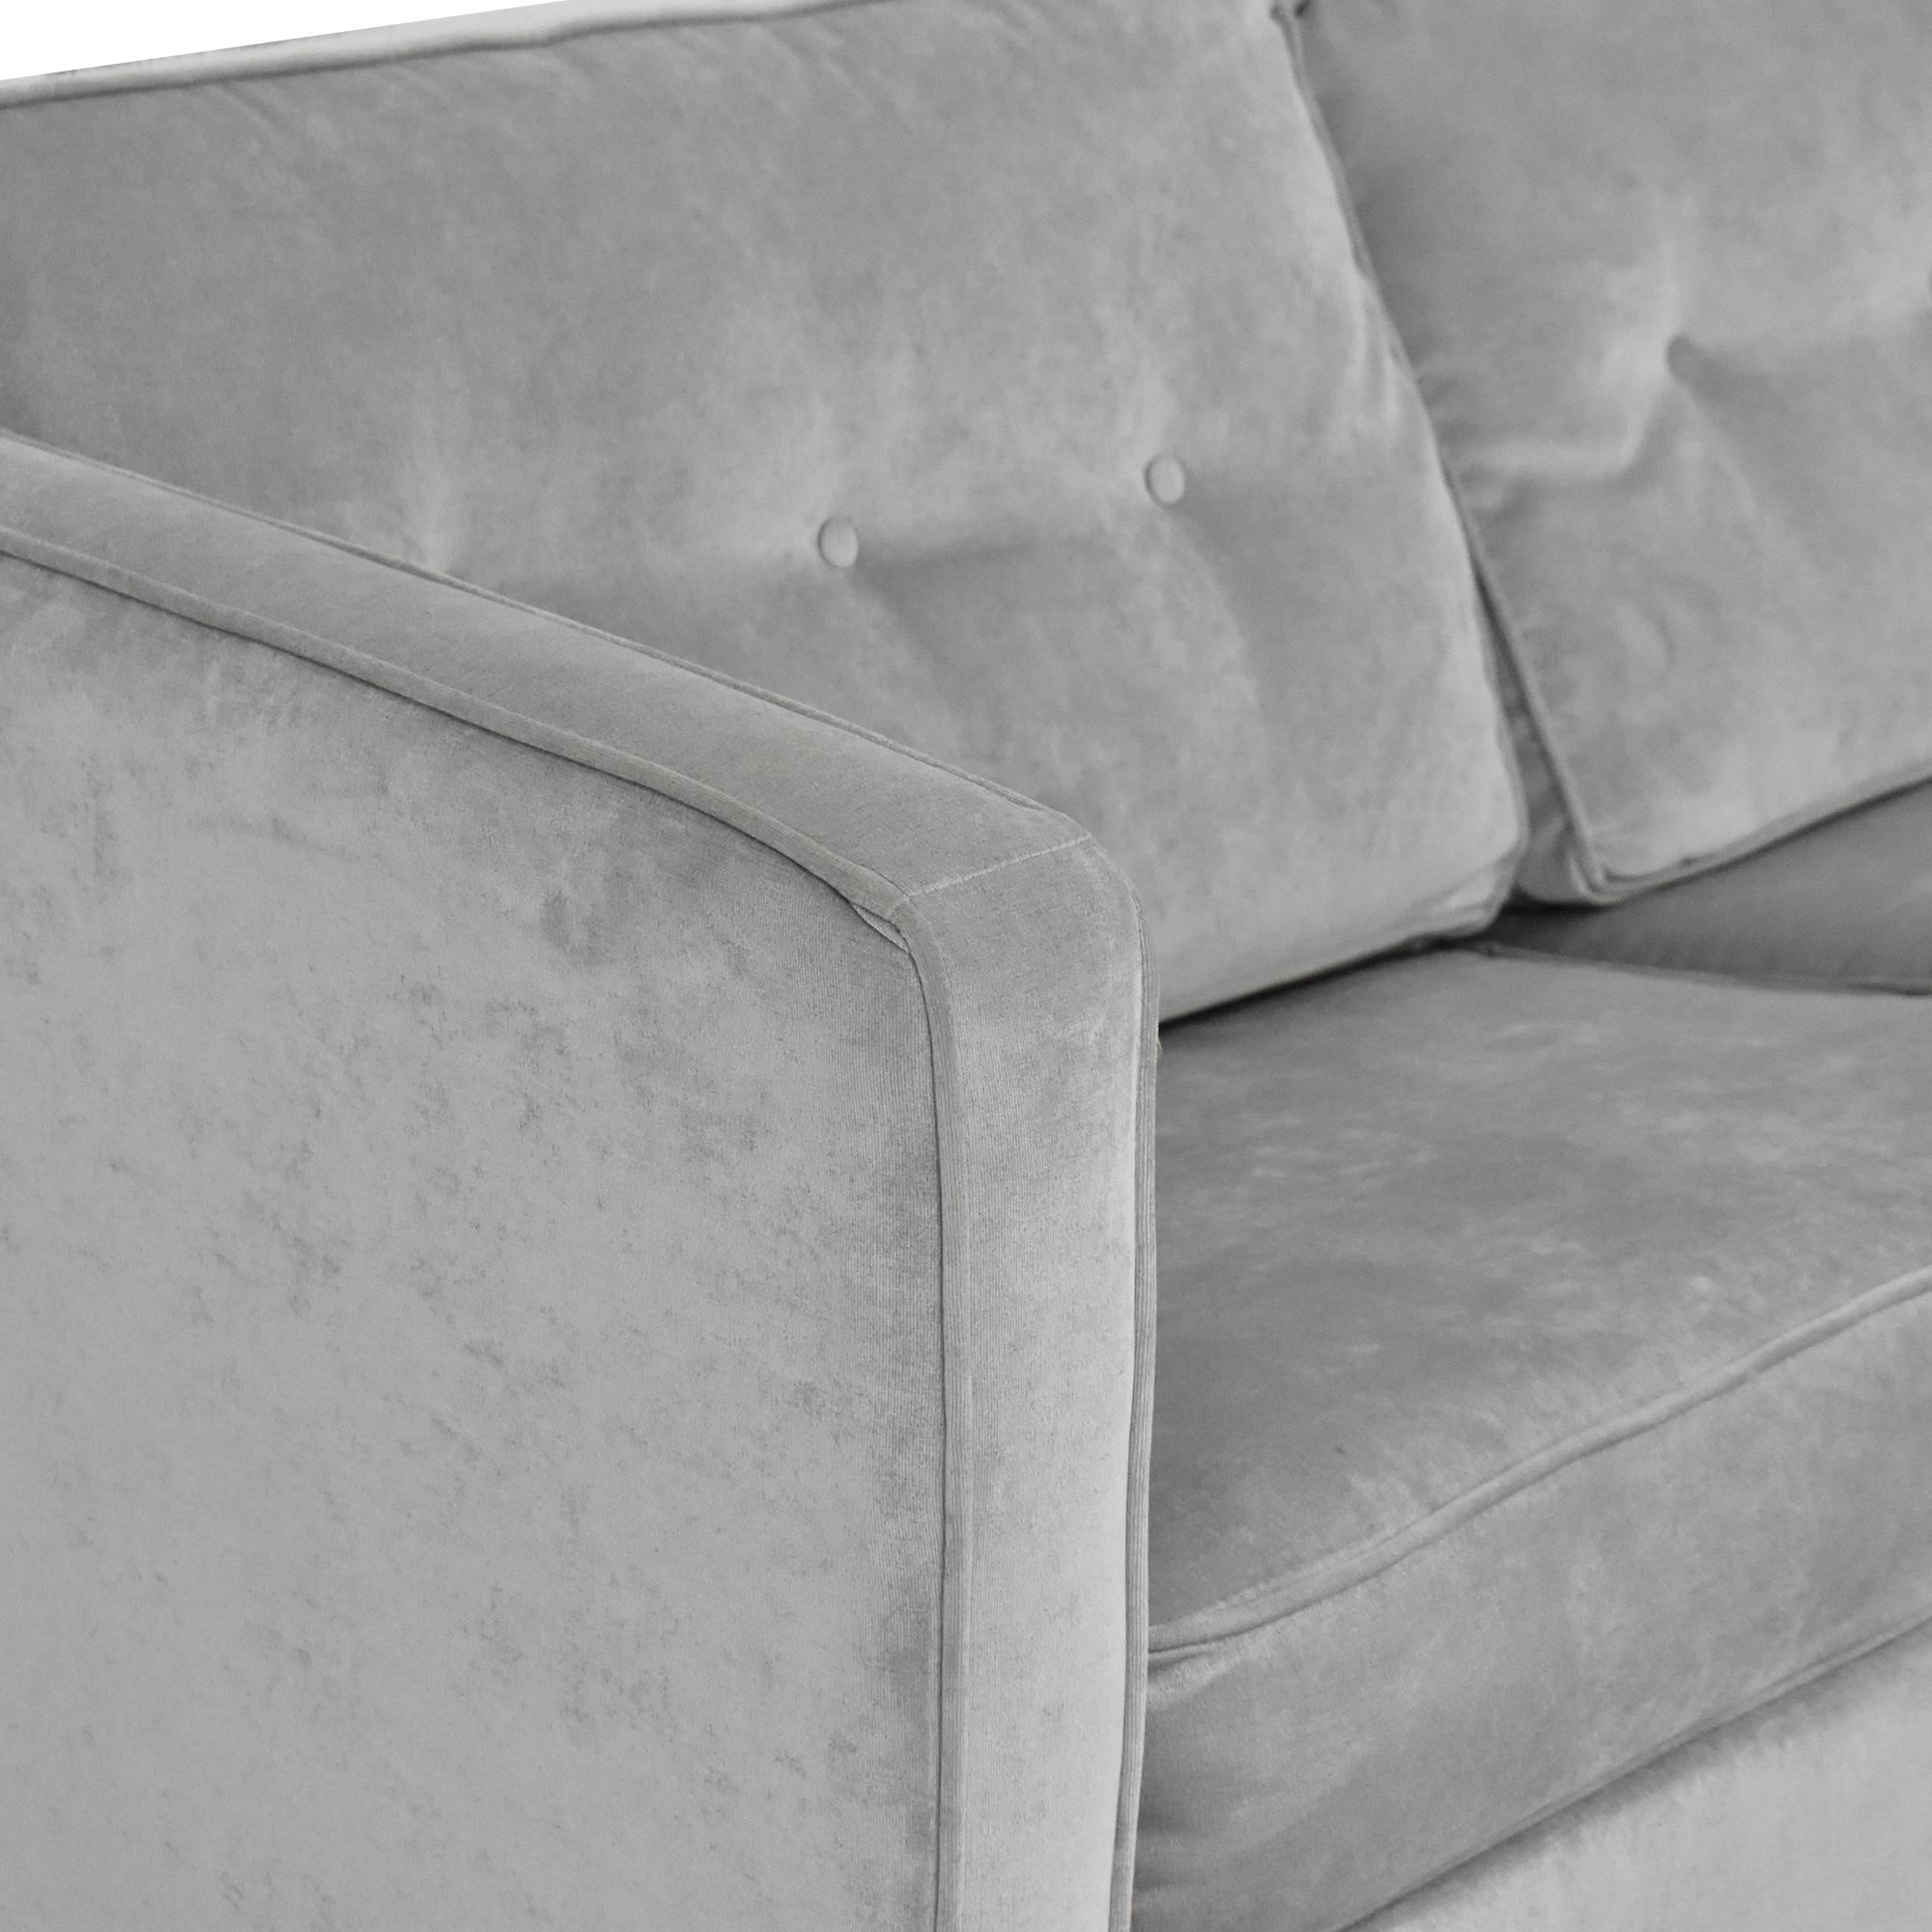 Wayfair Wayfair Ebern Designs Dengler Square Arm Sleeper Sofa nj